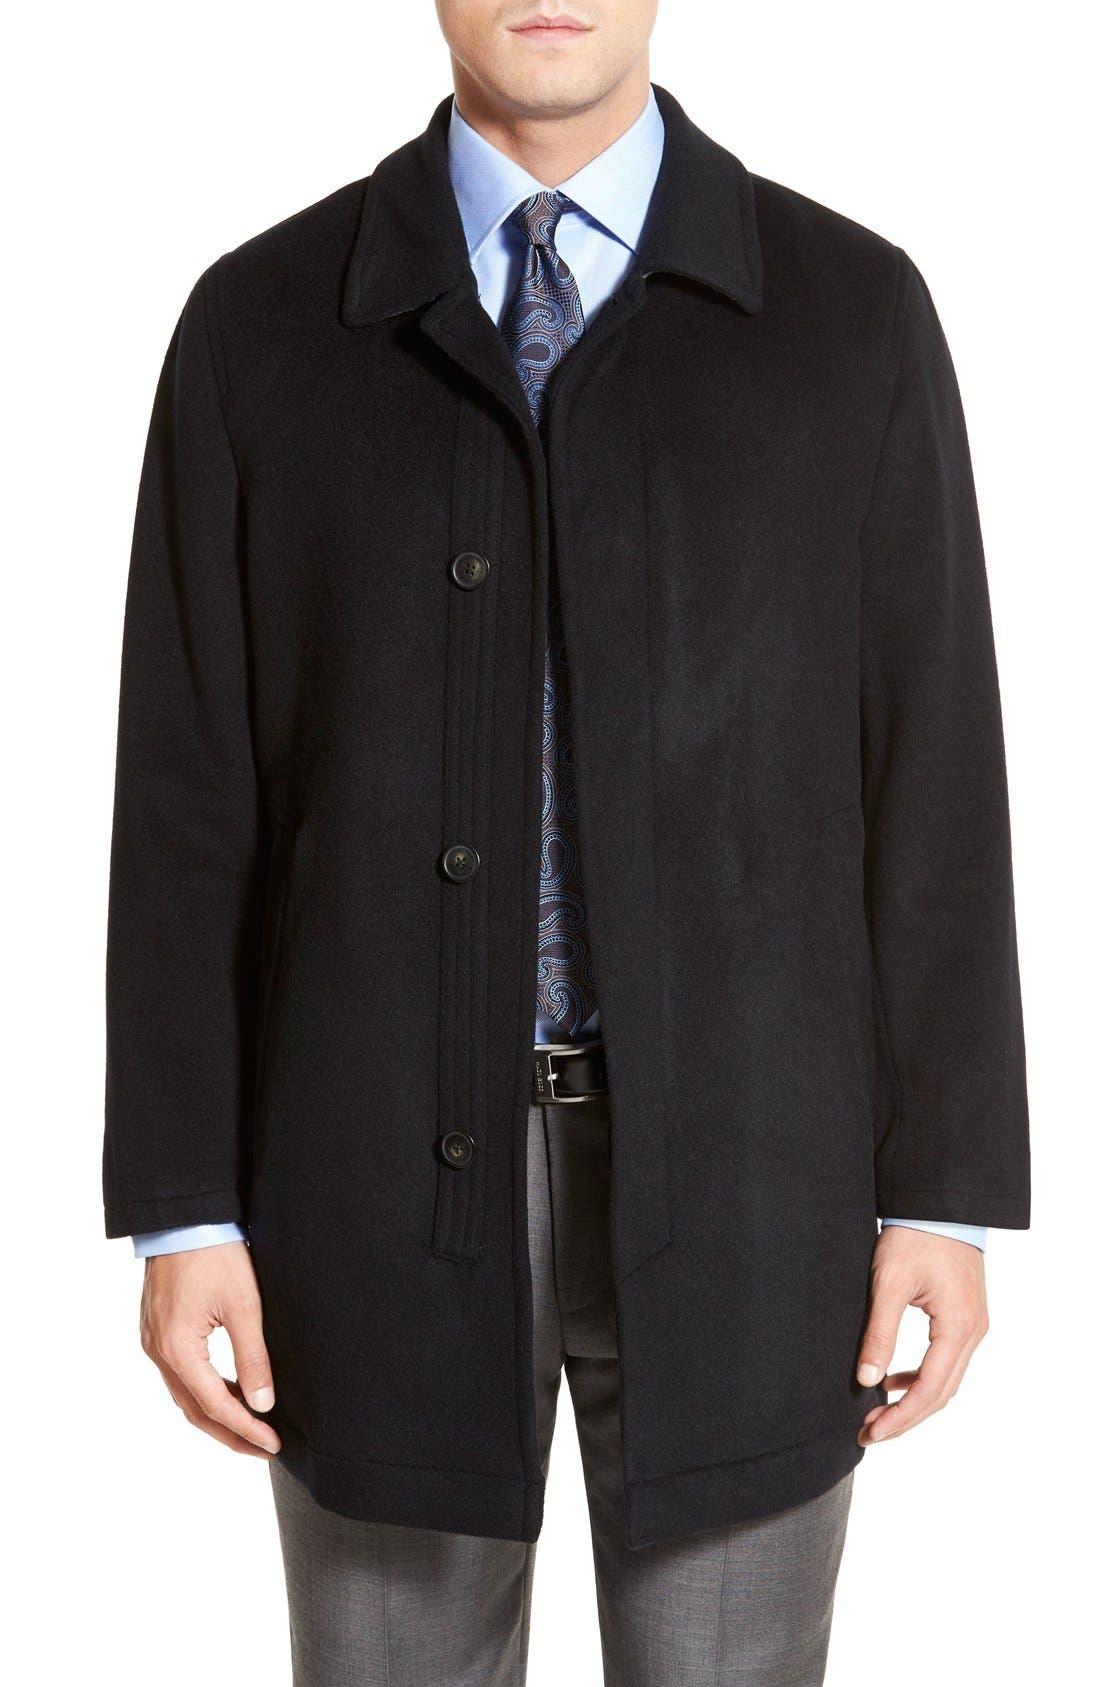 Douglas Modern Fit Wool & Cashmere Overcoat,                             Main thumbnail 1, color,